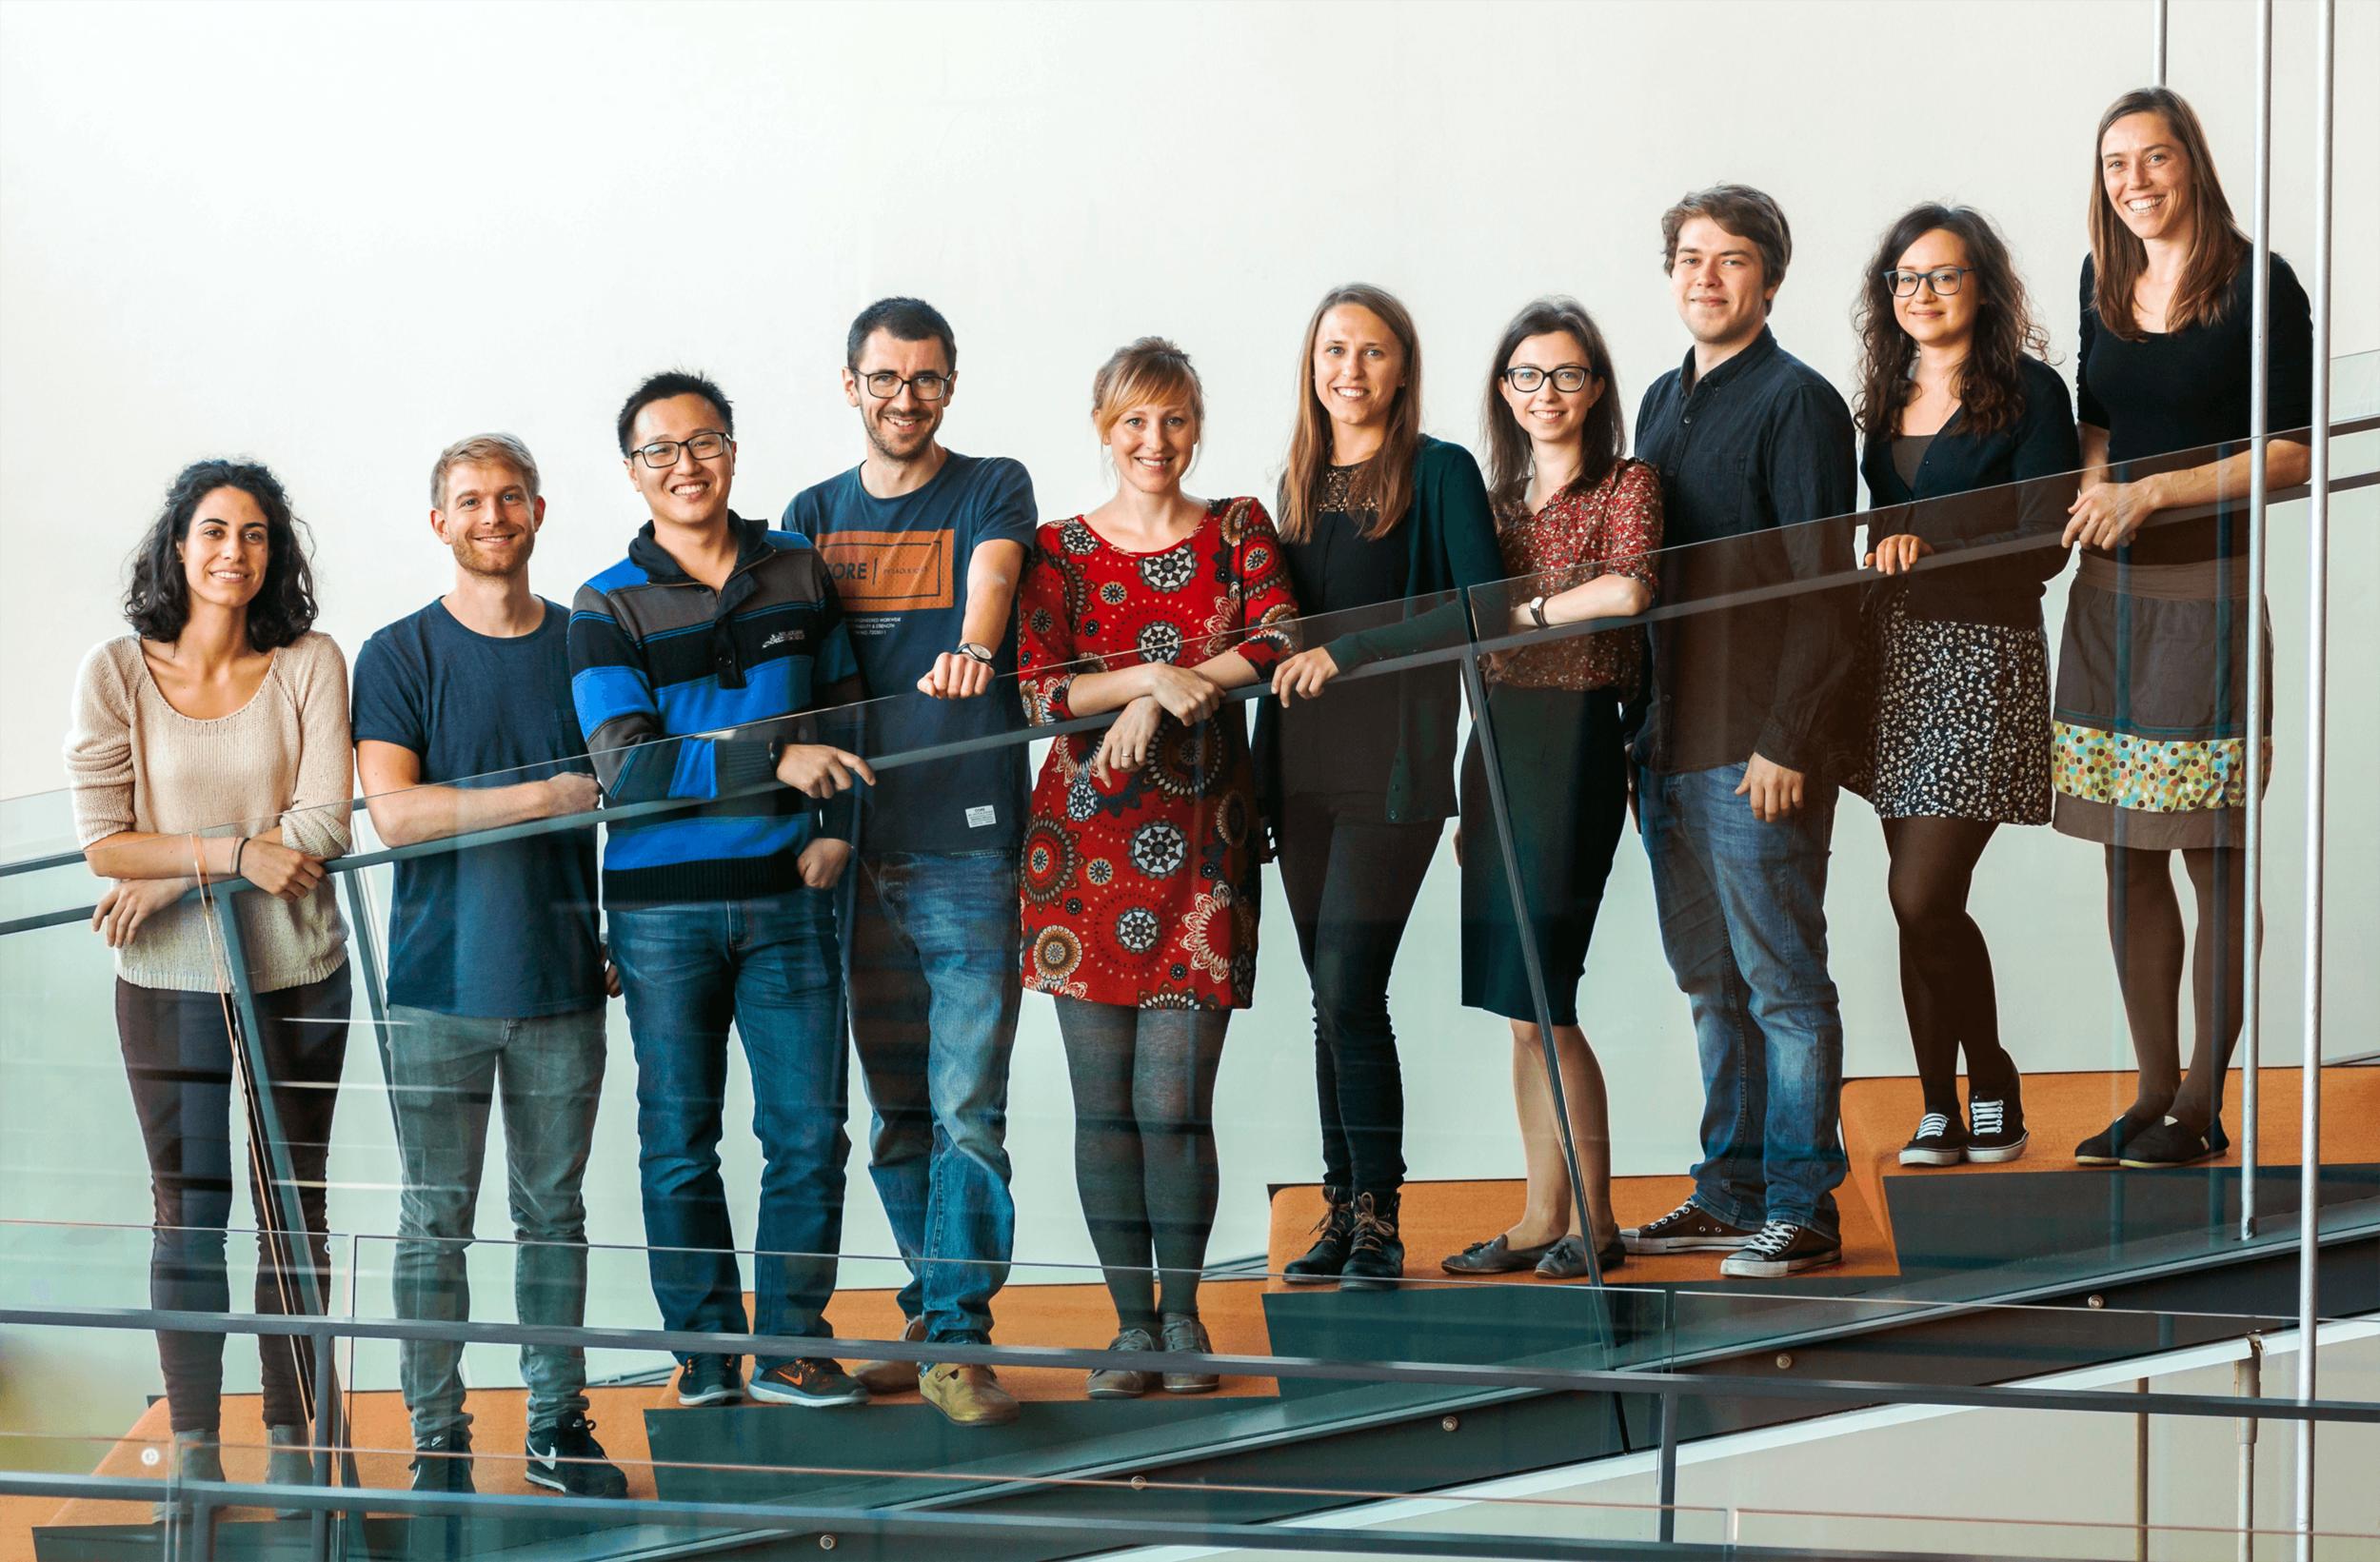 Treutlein group in October 2018 (missing: Sabina Kanton and Johannes Krumm)